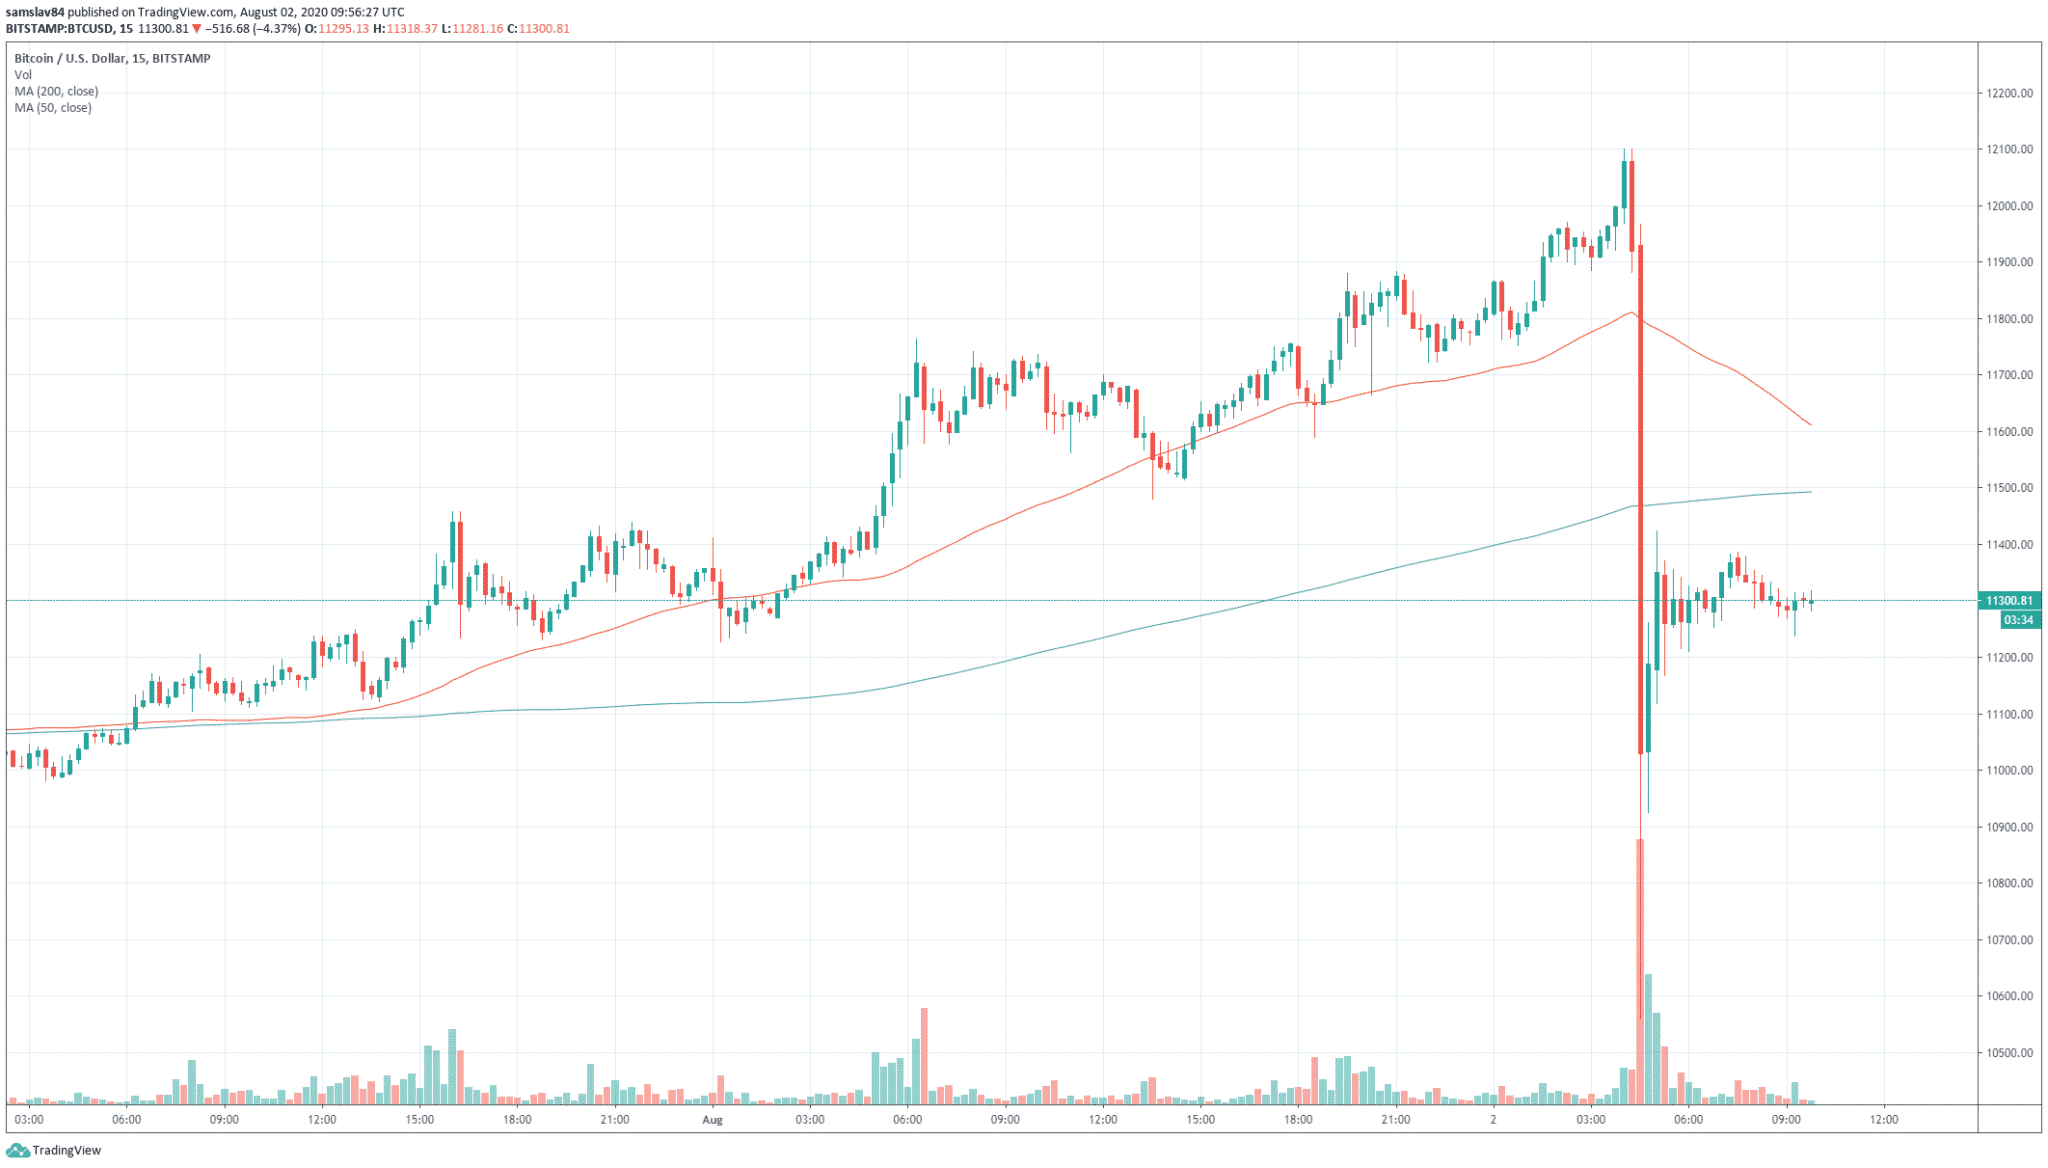 15m BTC / USD - bitstamp